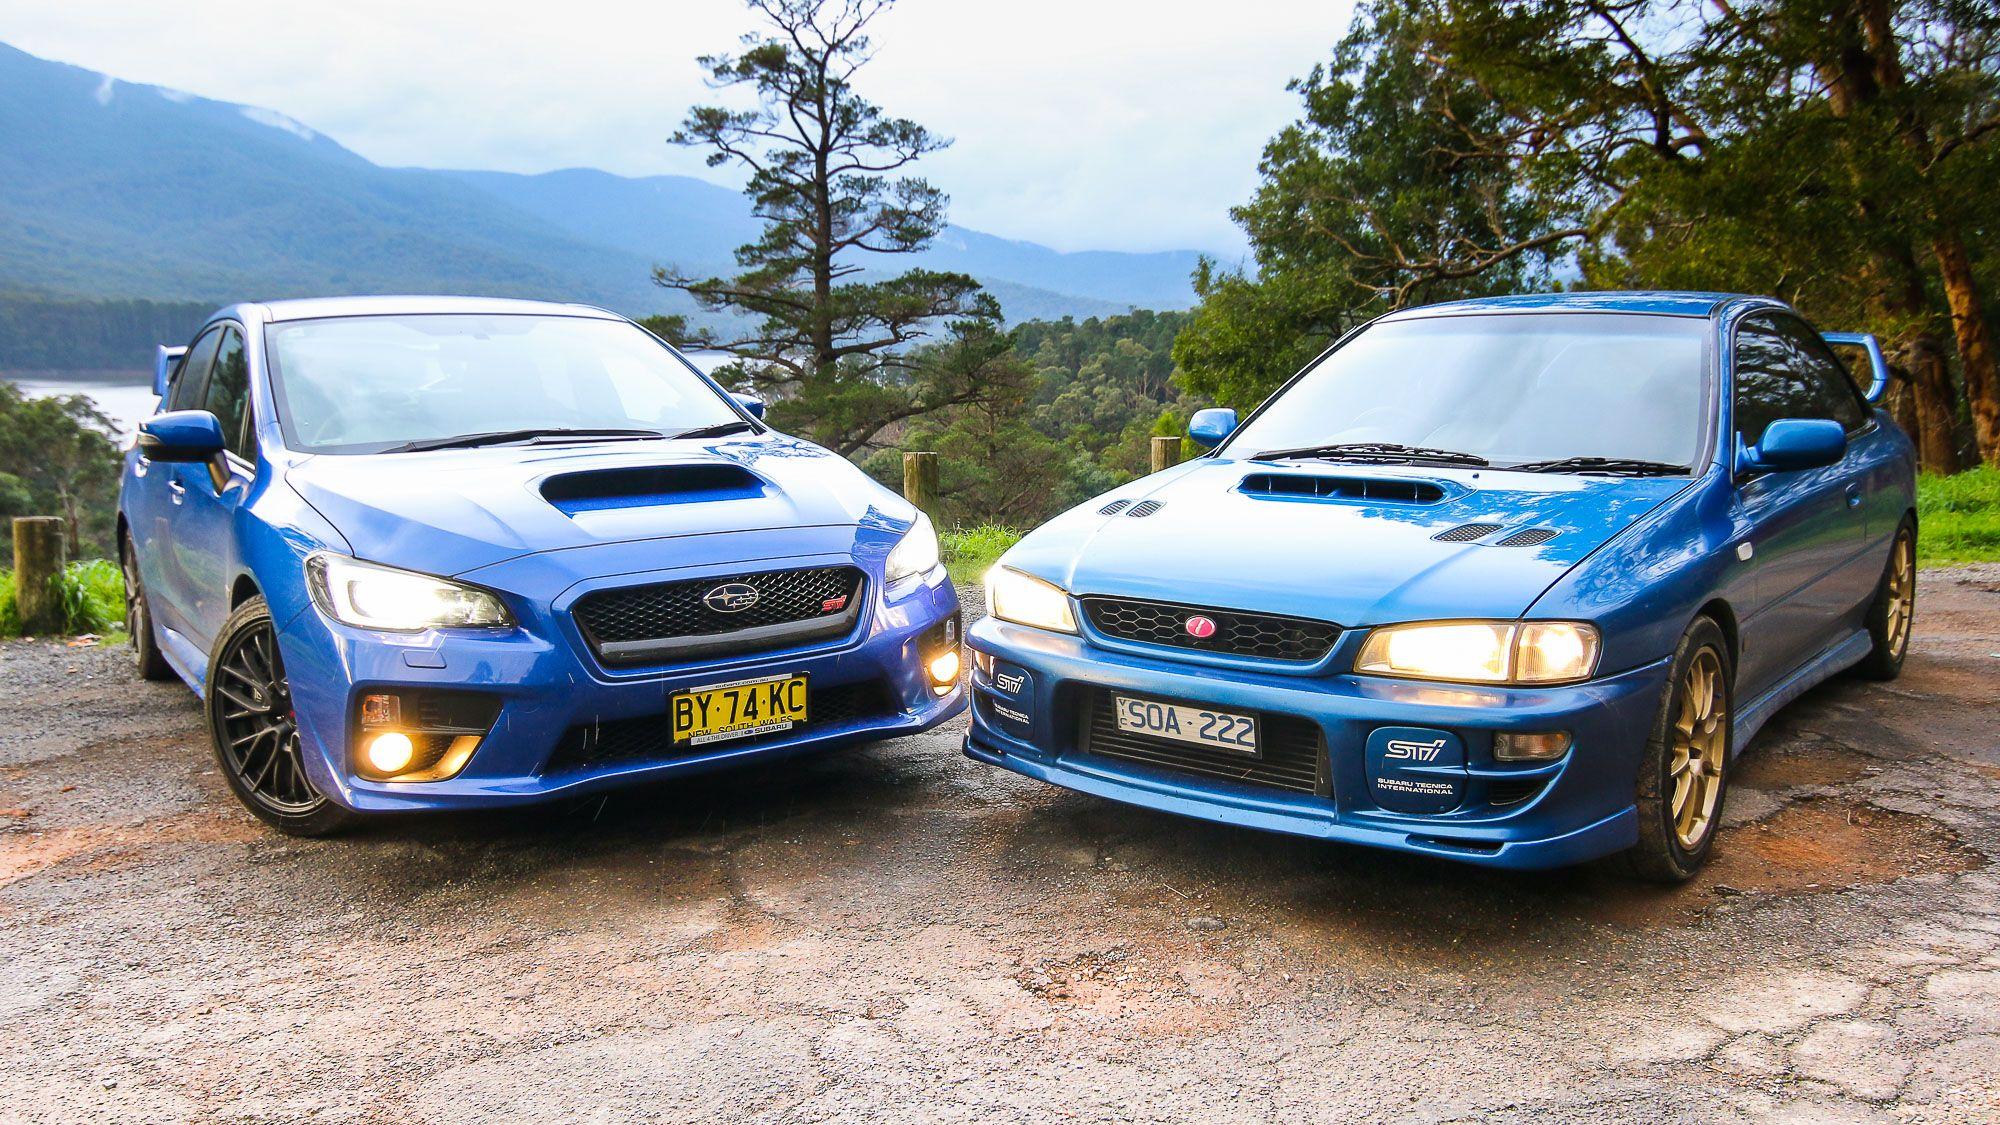 Subaru wrx sti comparison 2015 sedan v 1999 two door http